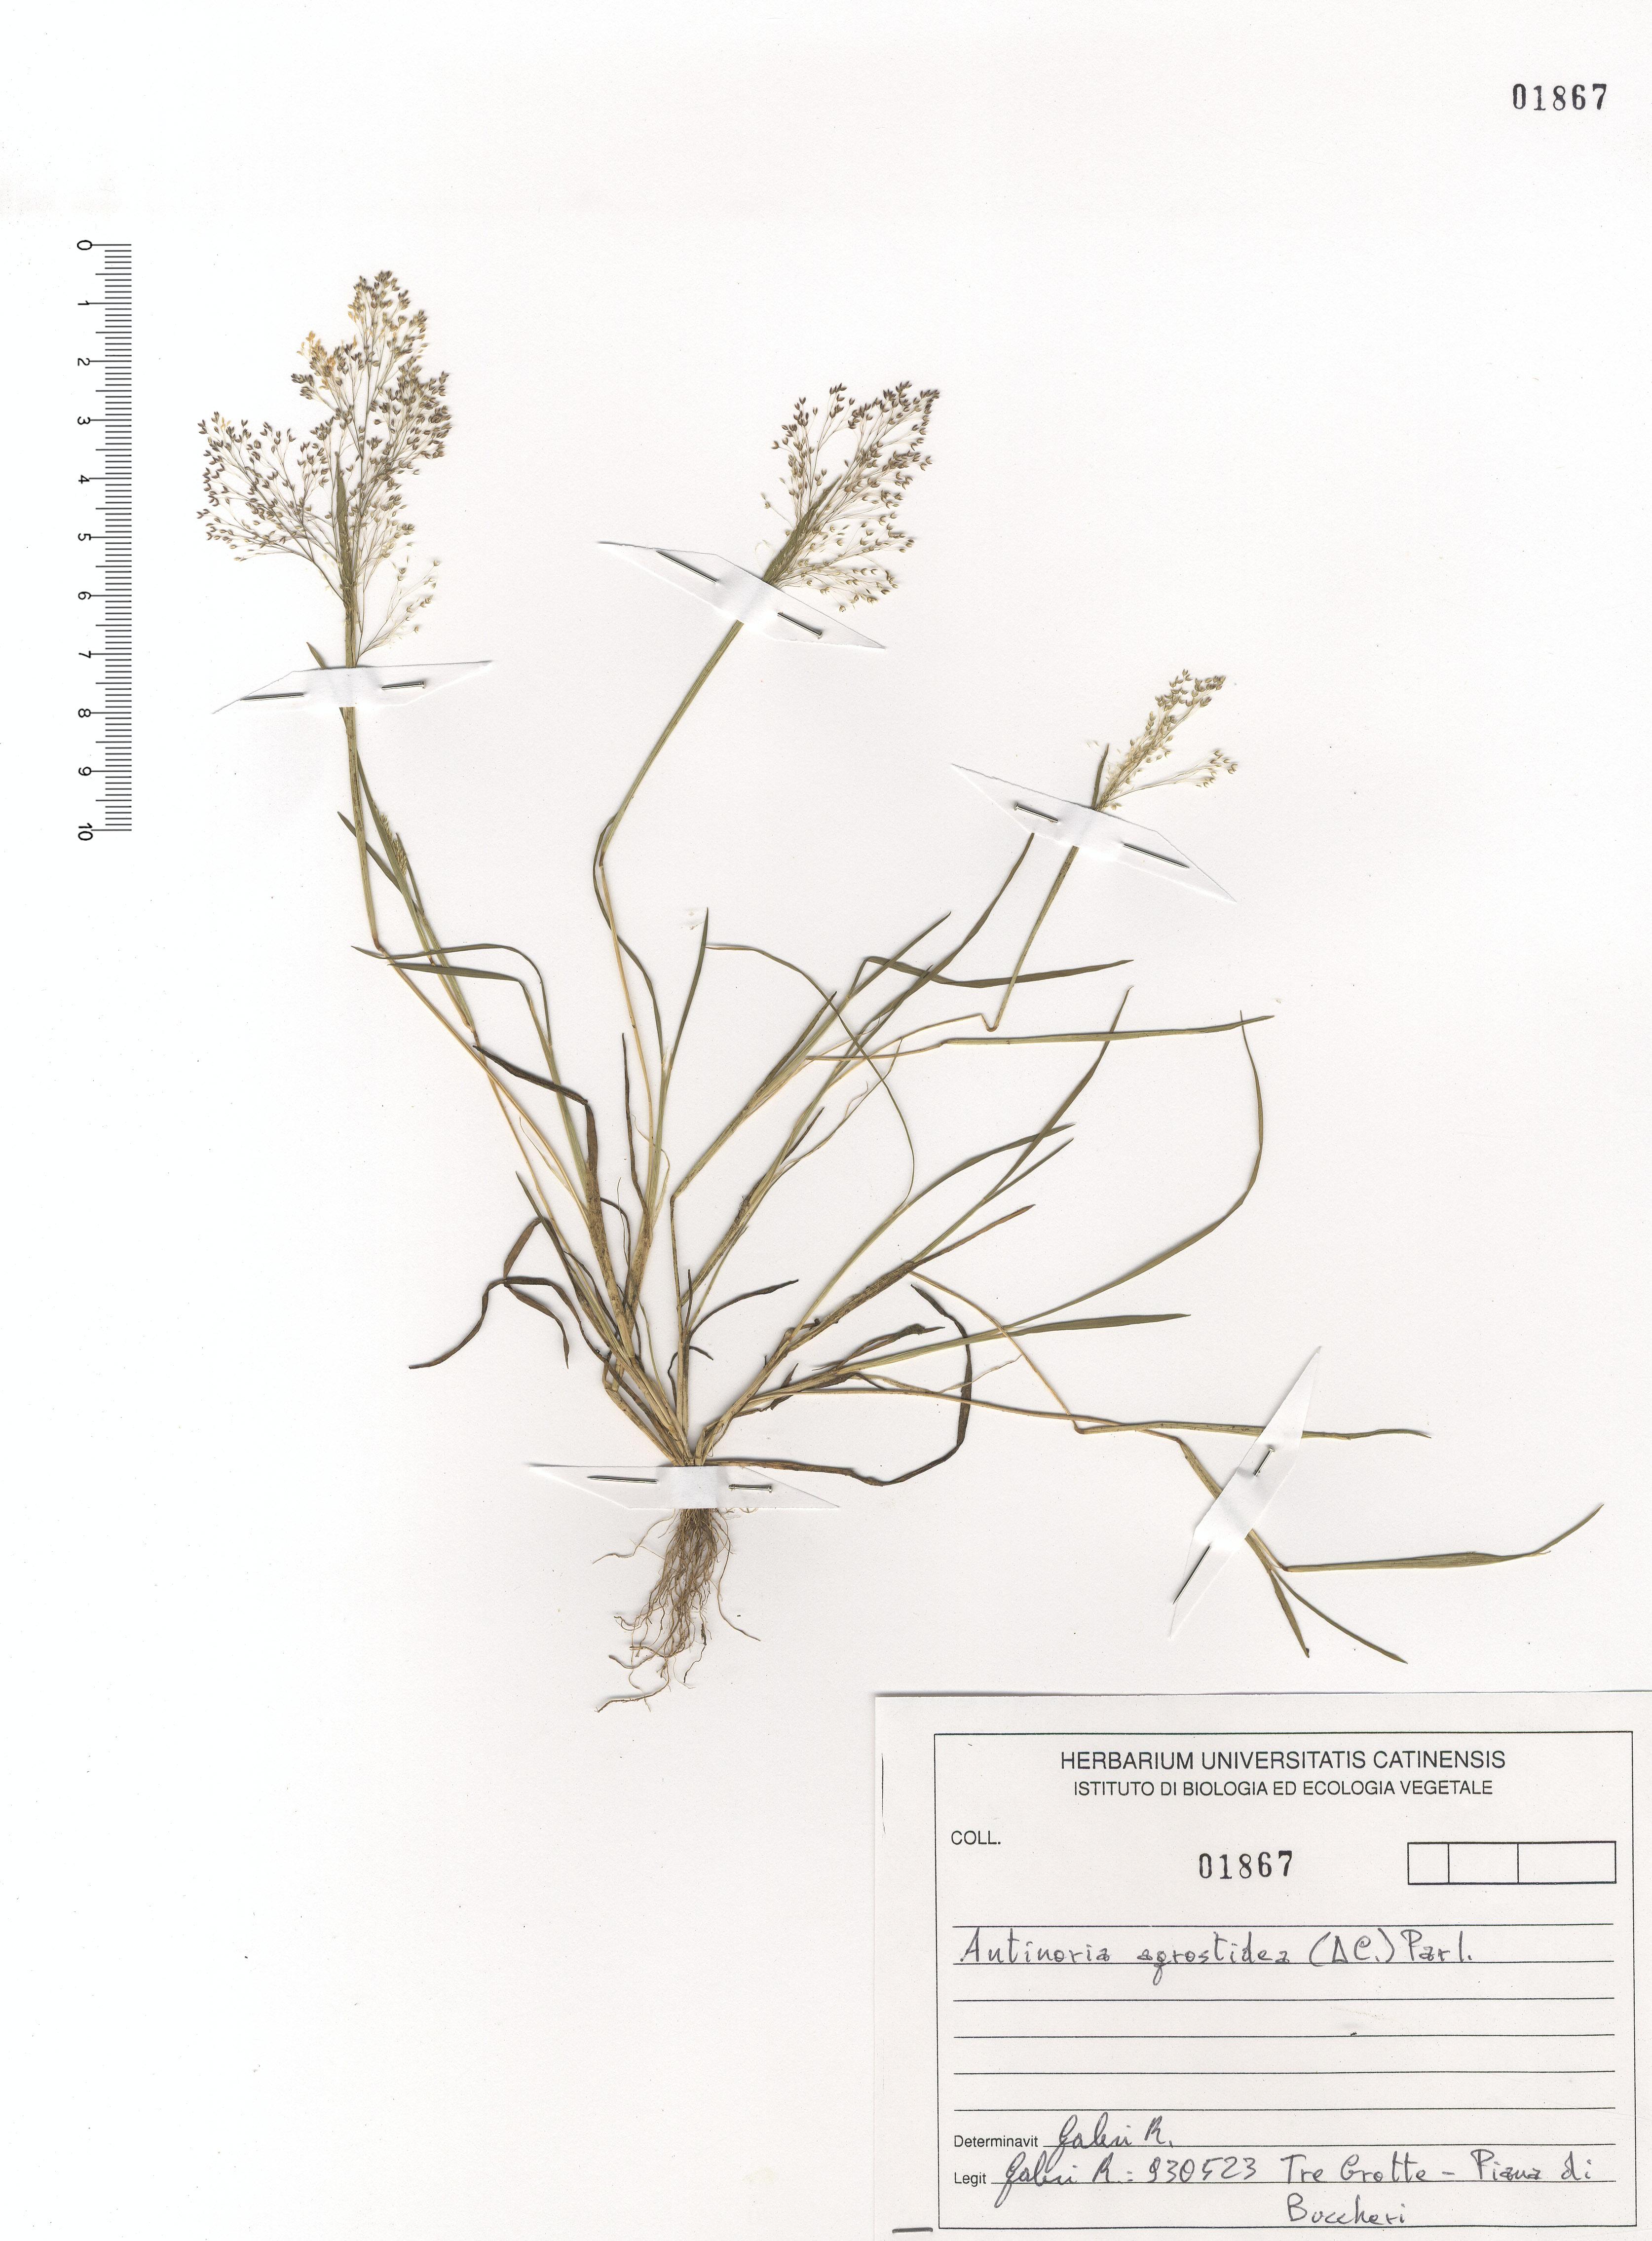 © Hortus Botanicus Catinensis - Herb. shhet 101867<br>